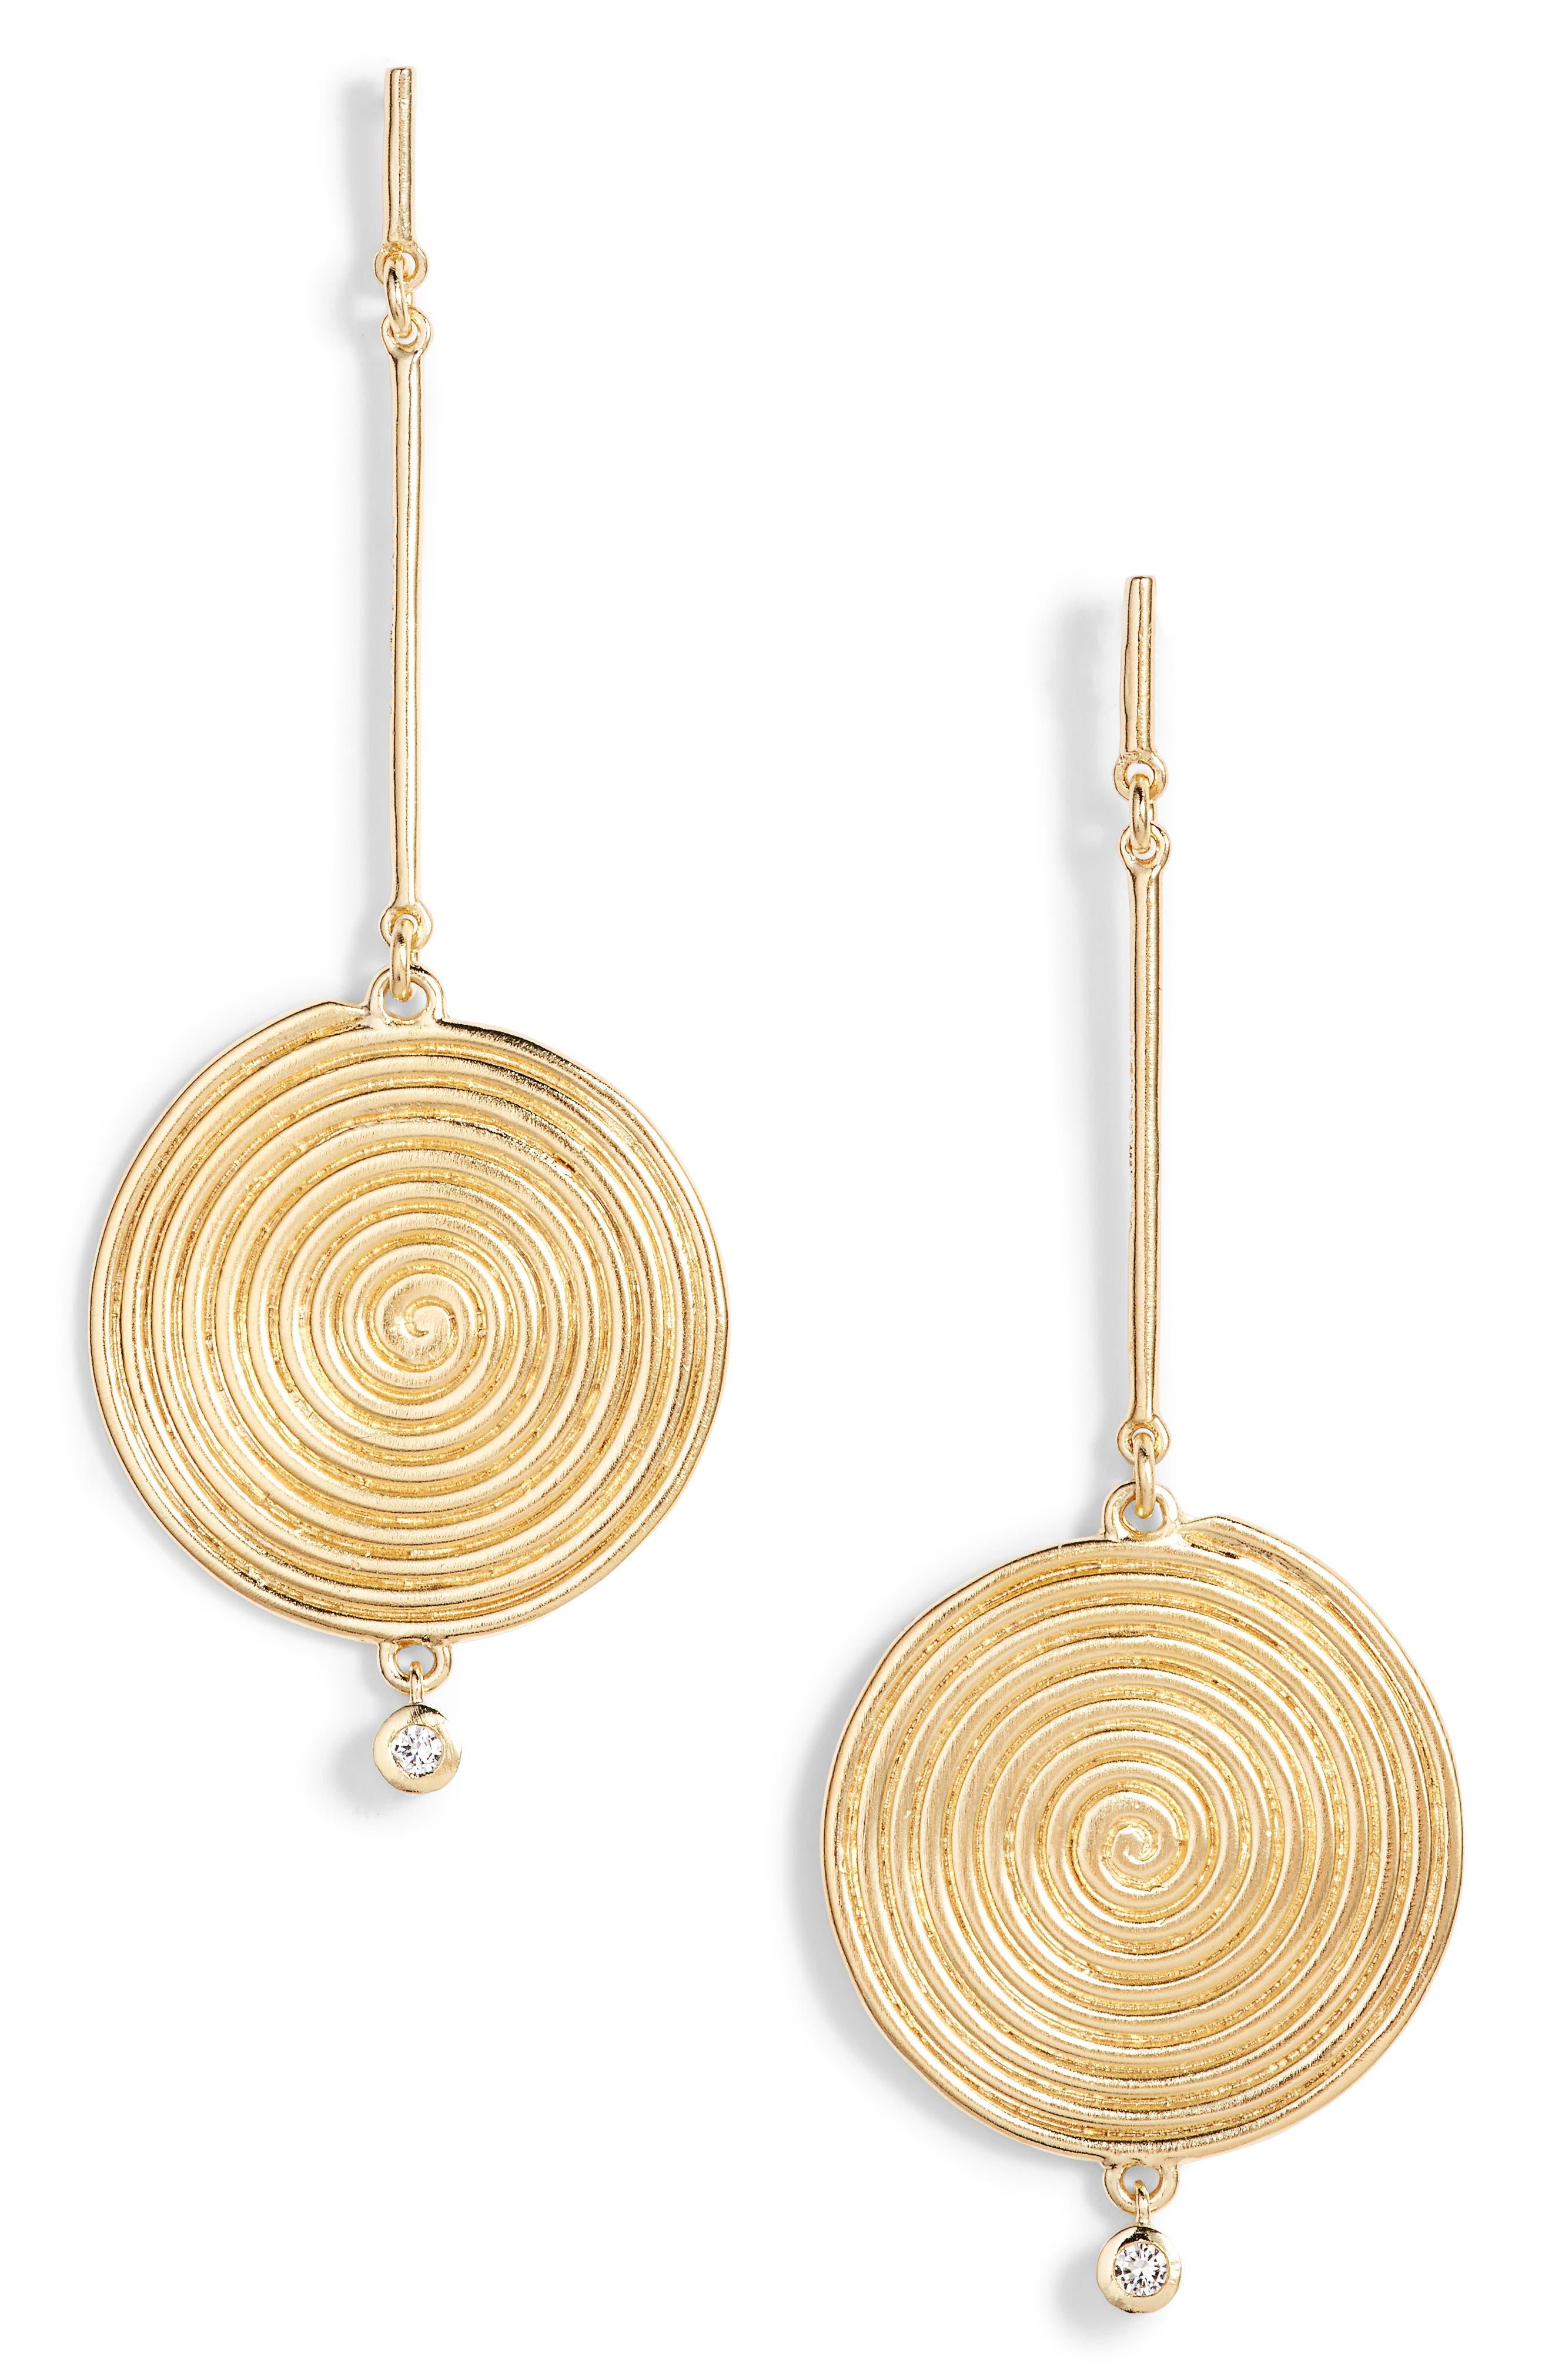 Alternate Image 1 Selected - Elizabeth and James Sullivan - Lainey White Topaz Drop Earrings